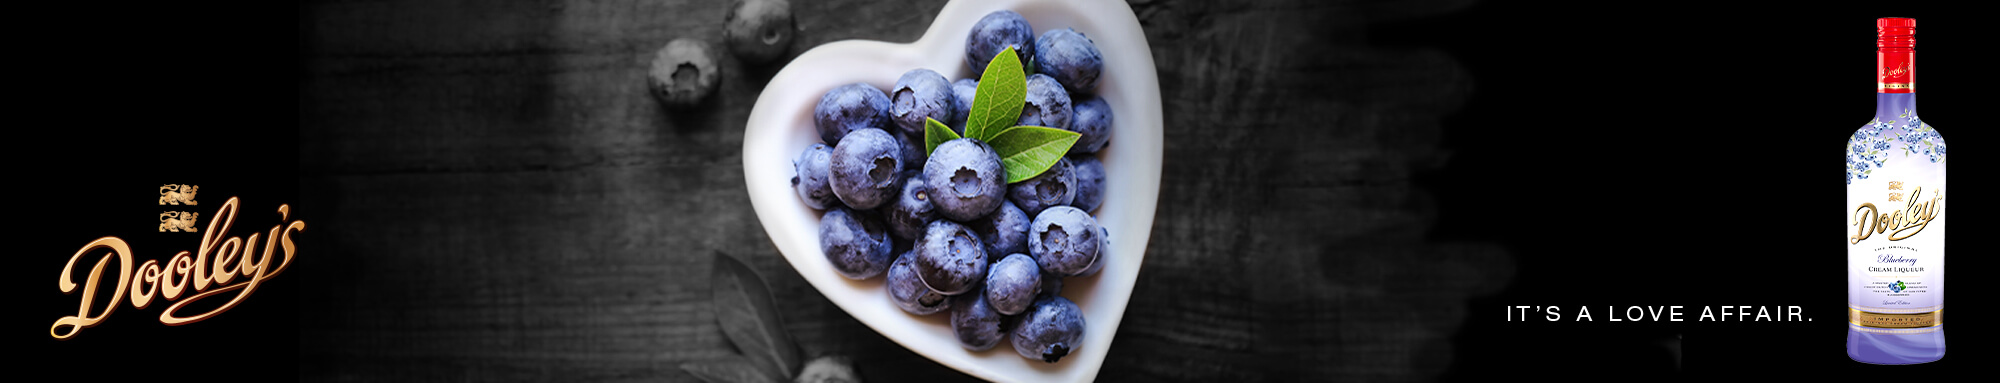 Dooleys Toffee Blueberry